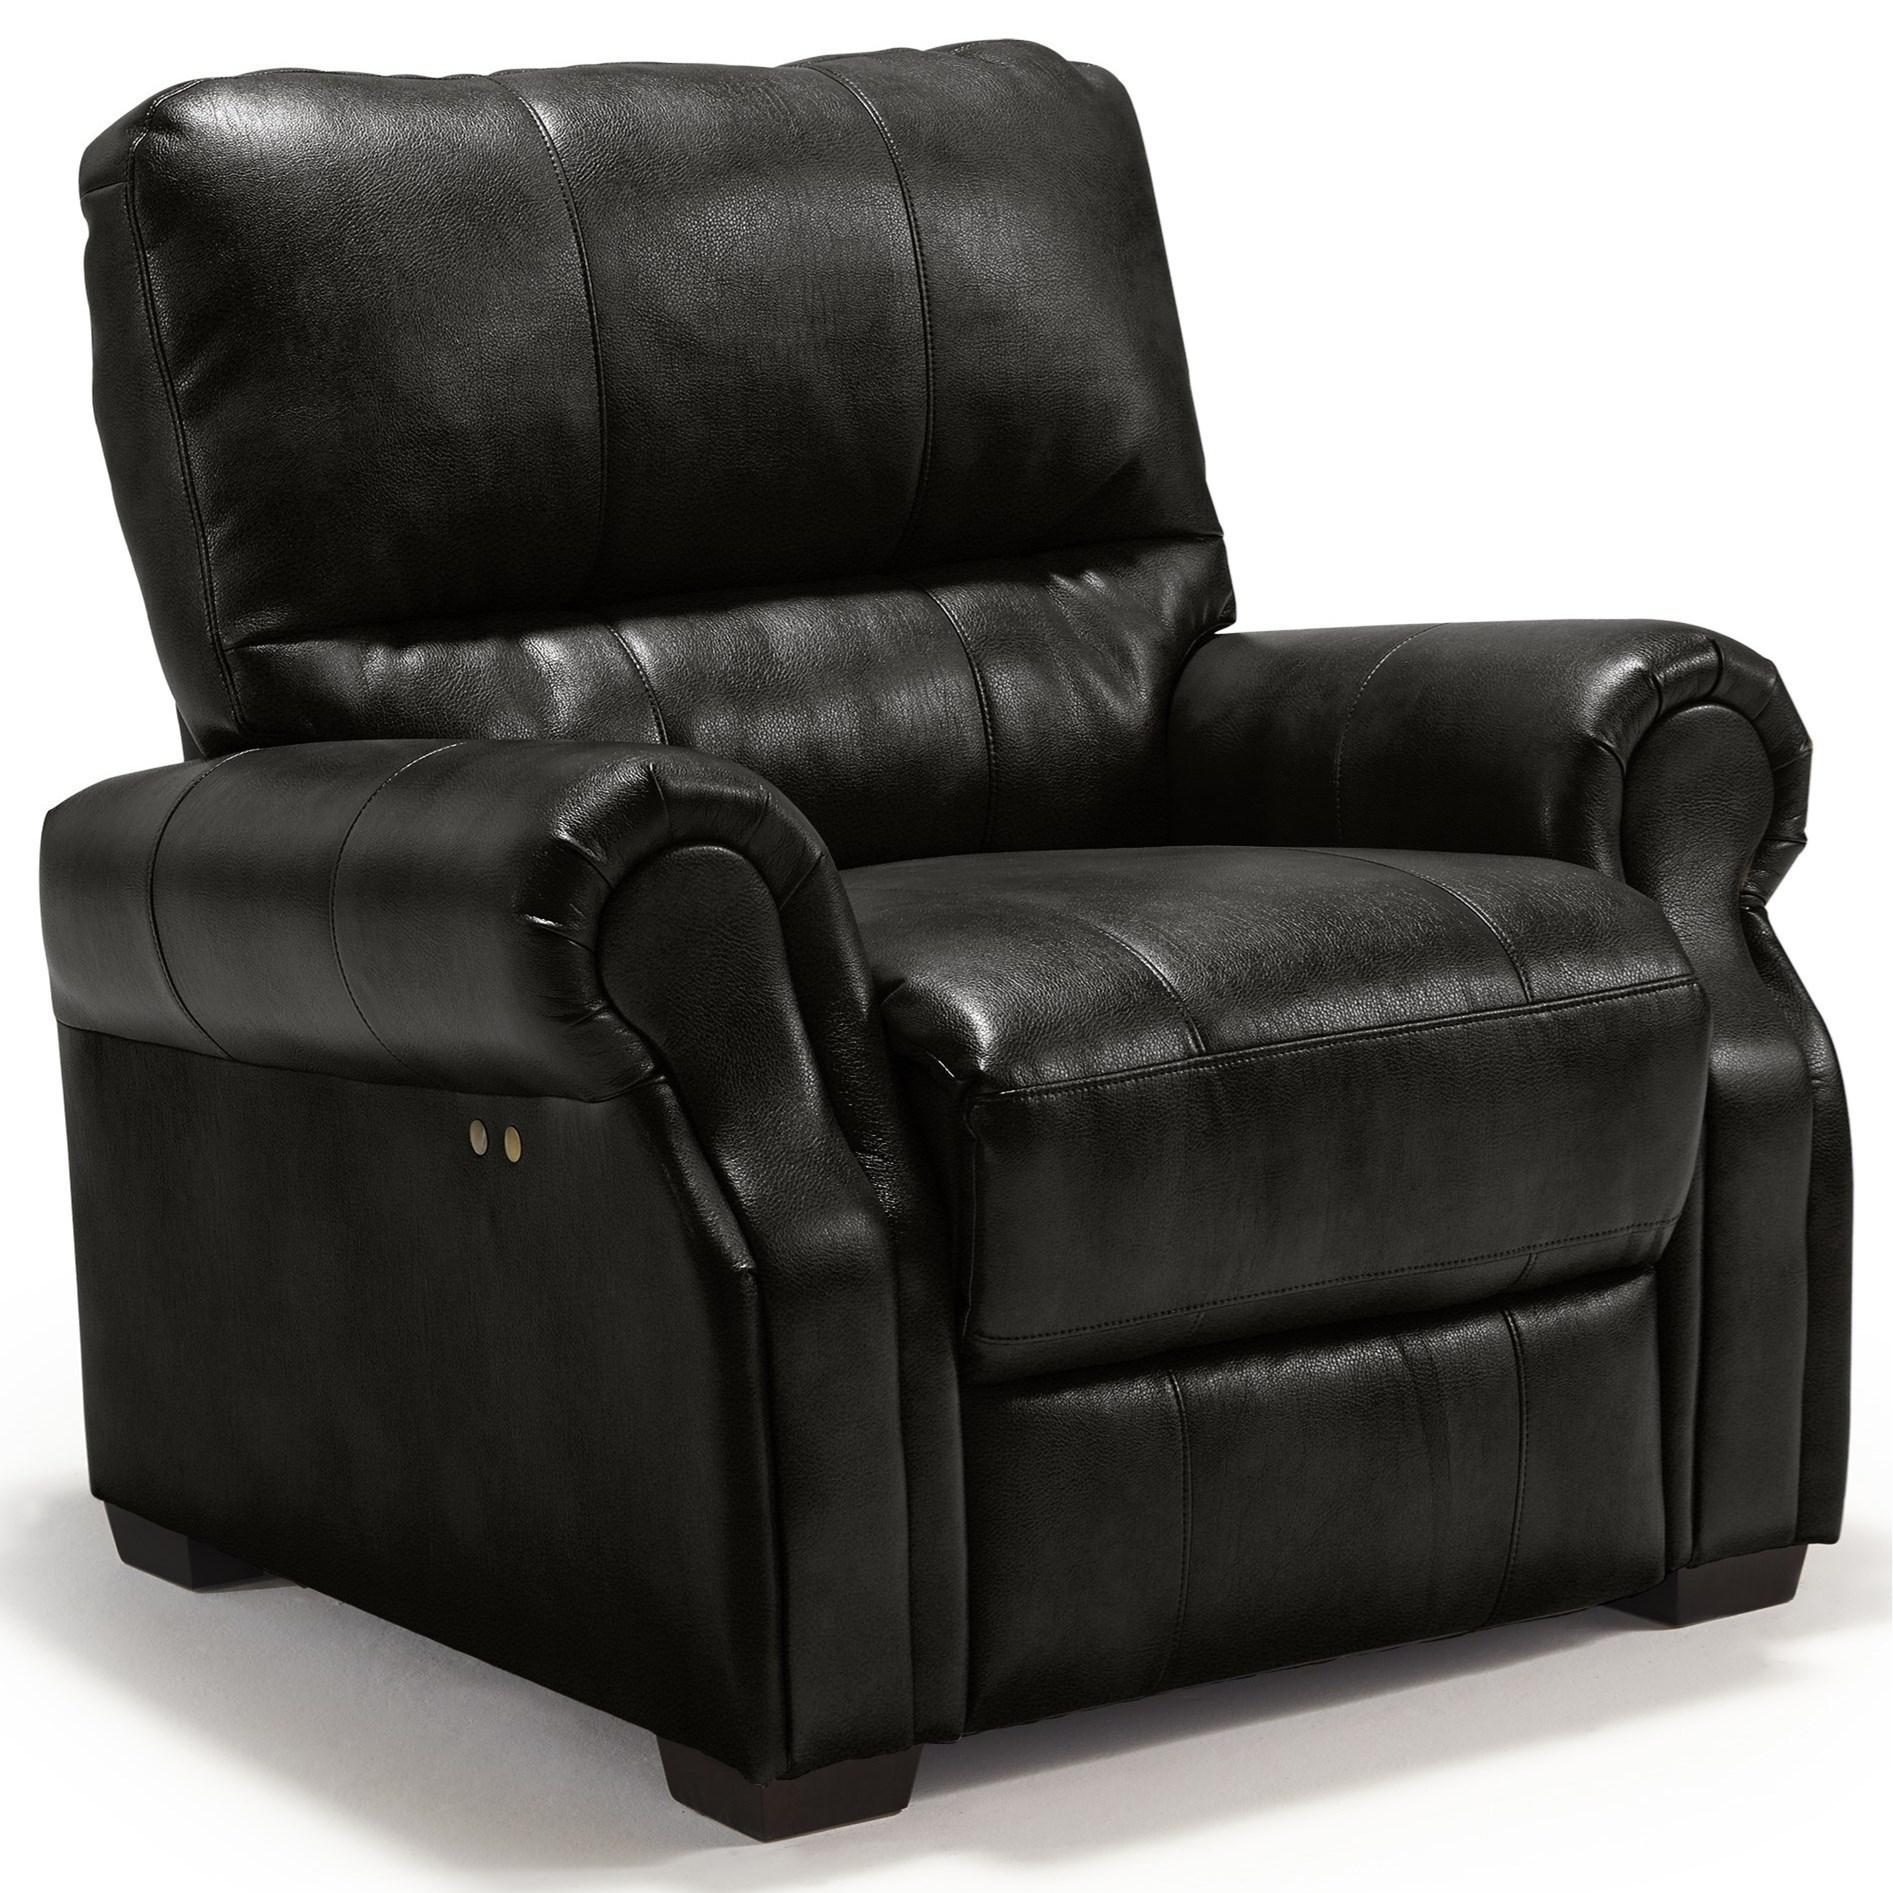 Best Home Furnishings Damien Power High Leg Recliner - Item Number: 2003483532-24623AU